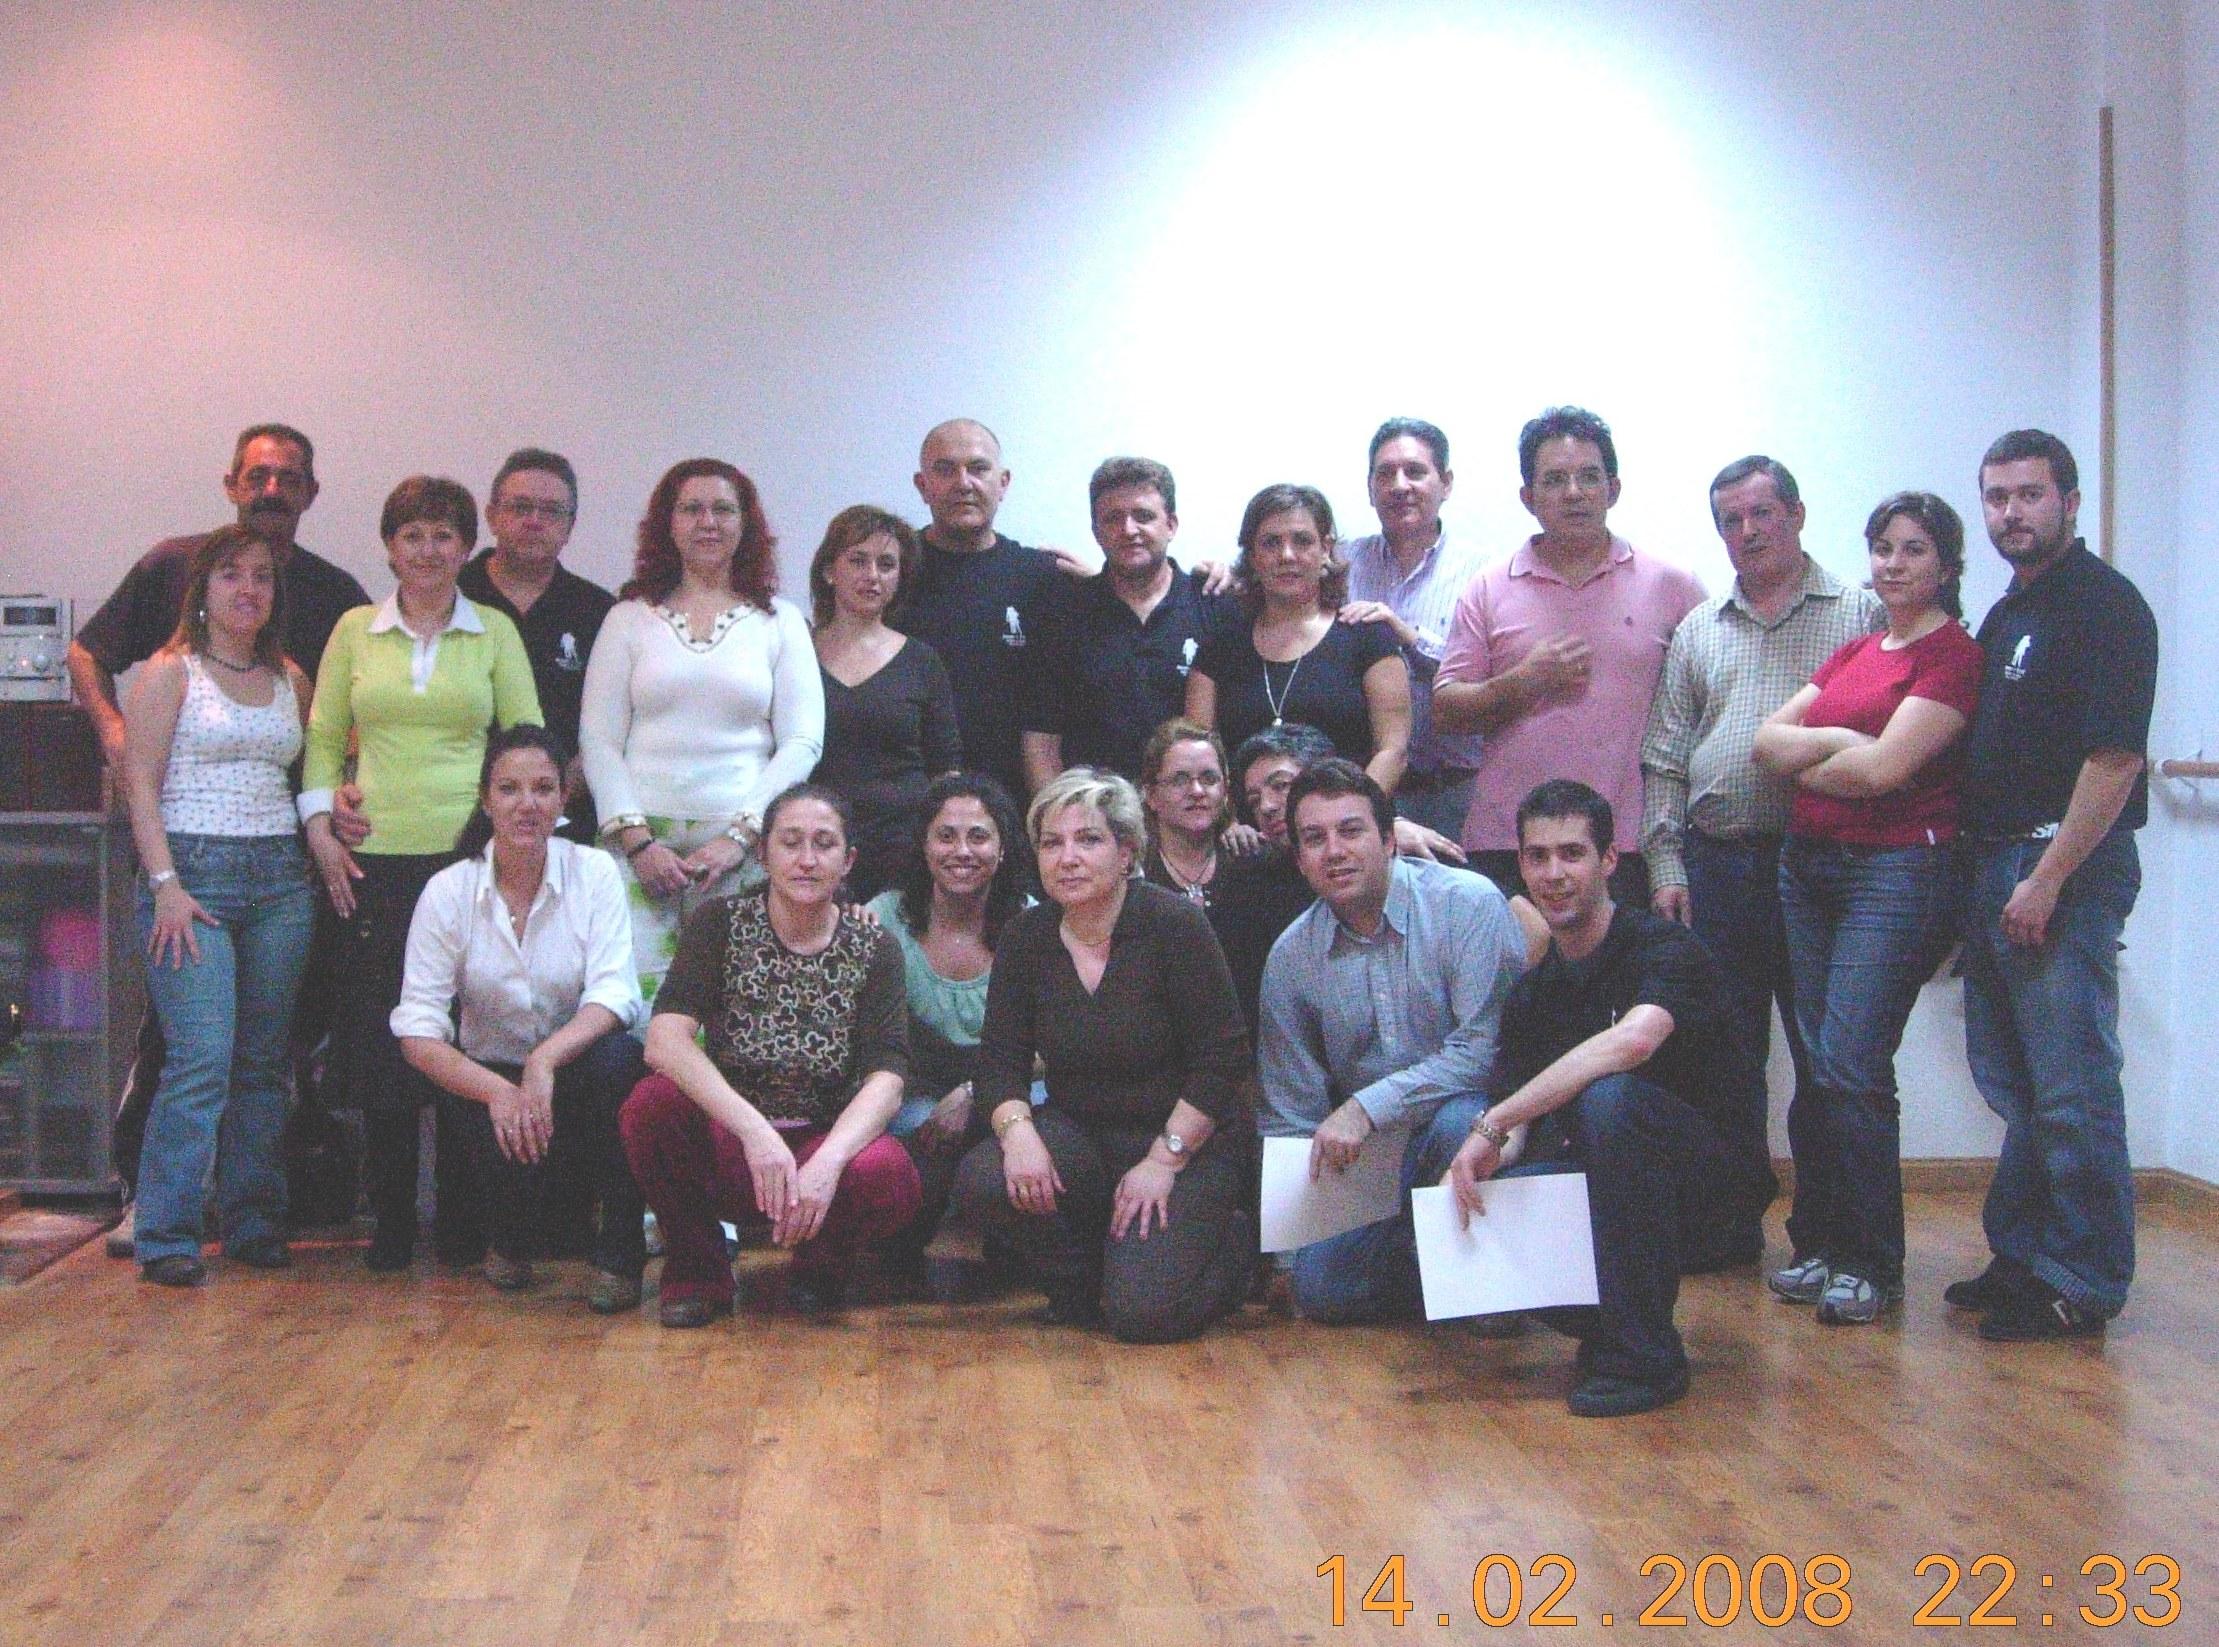 CLASES DE BAILE SALON EN MADRID - JUAN Y ROSI - Madrid